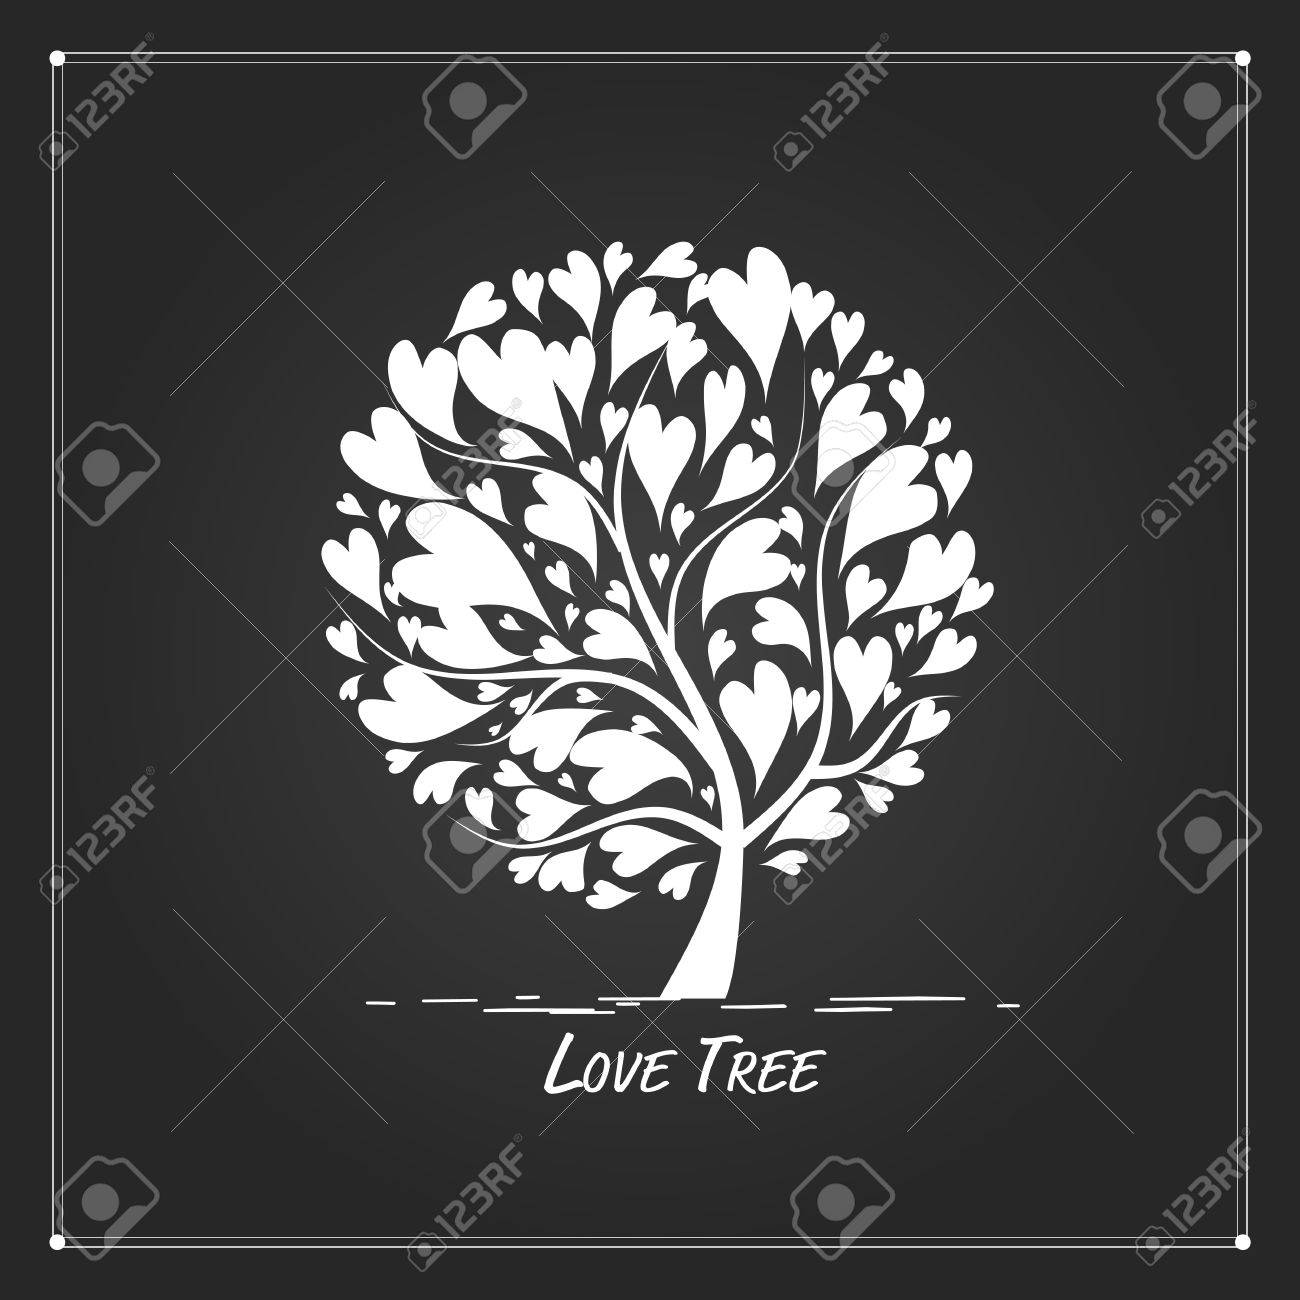 Love tree for your design. illustration - 68559202